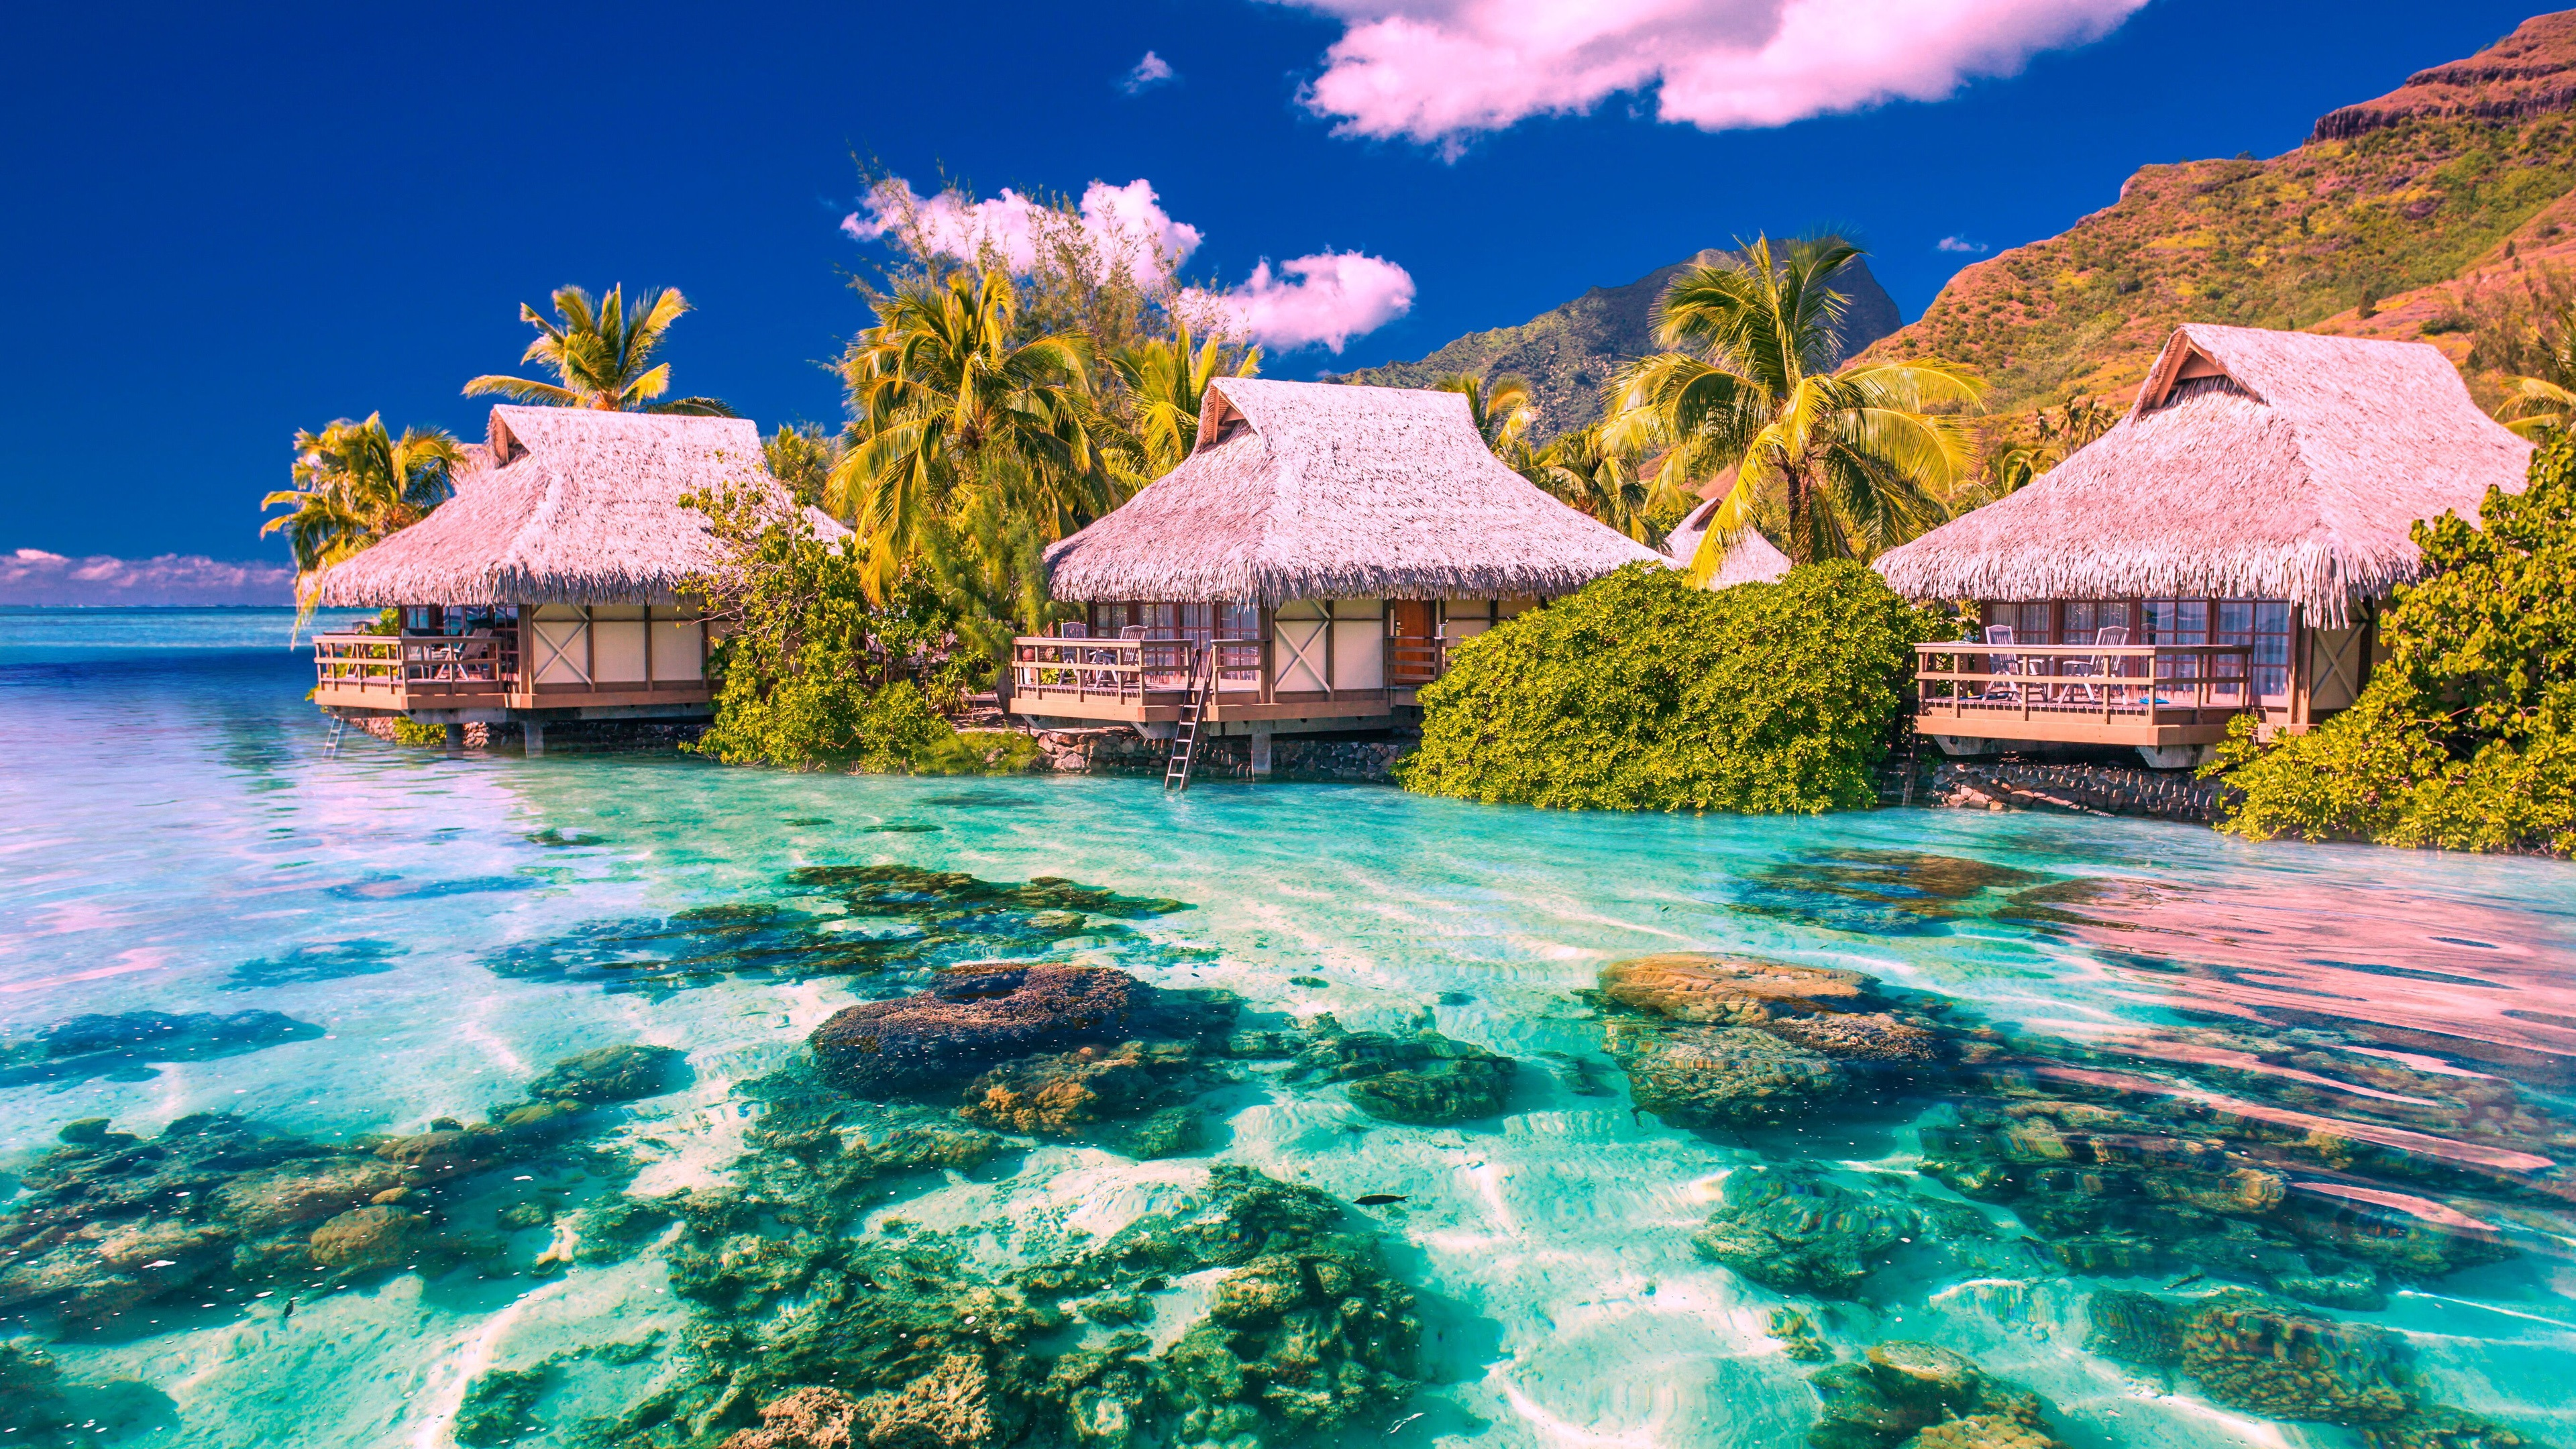 море отдых курорт дома  № 1447397 бесплатно